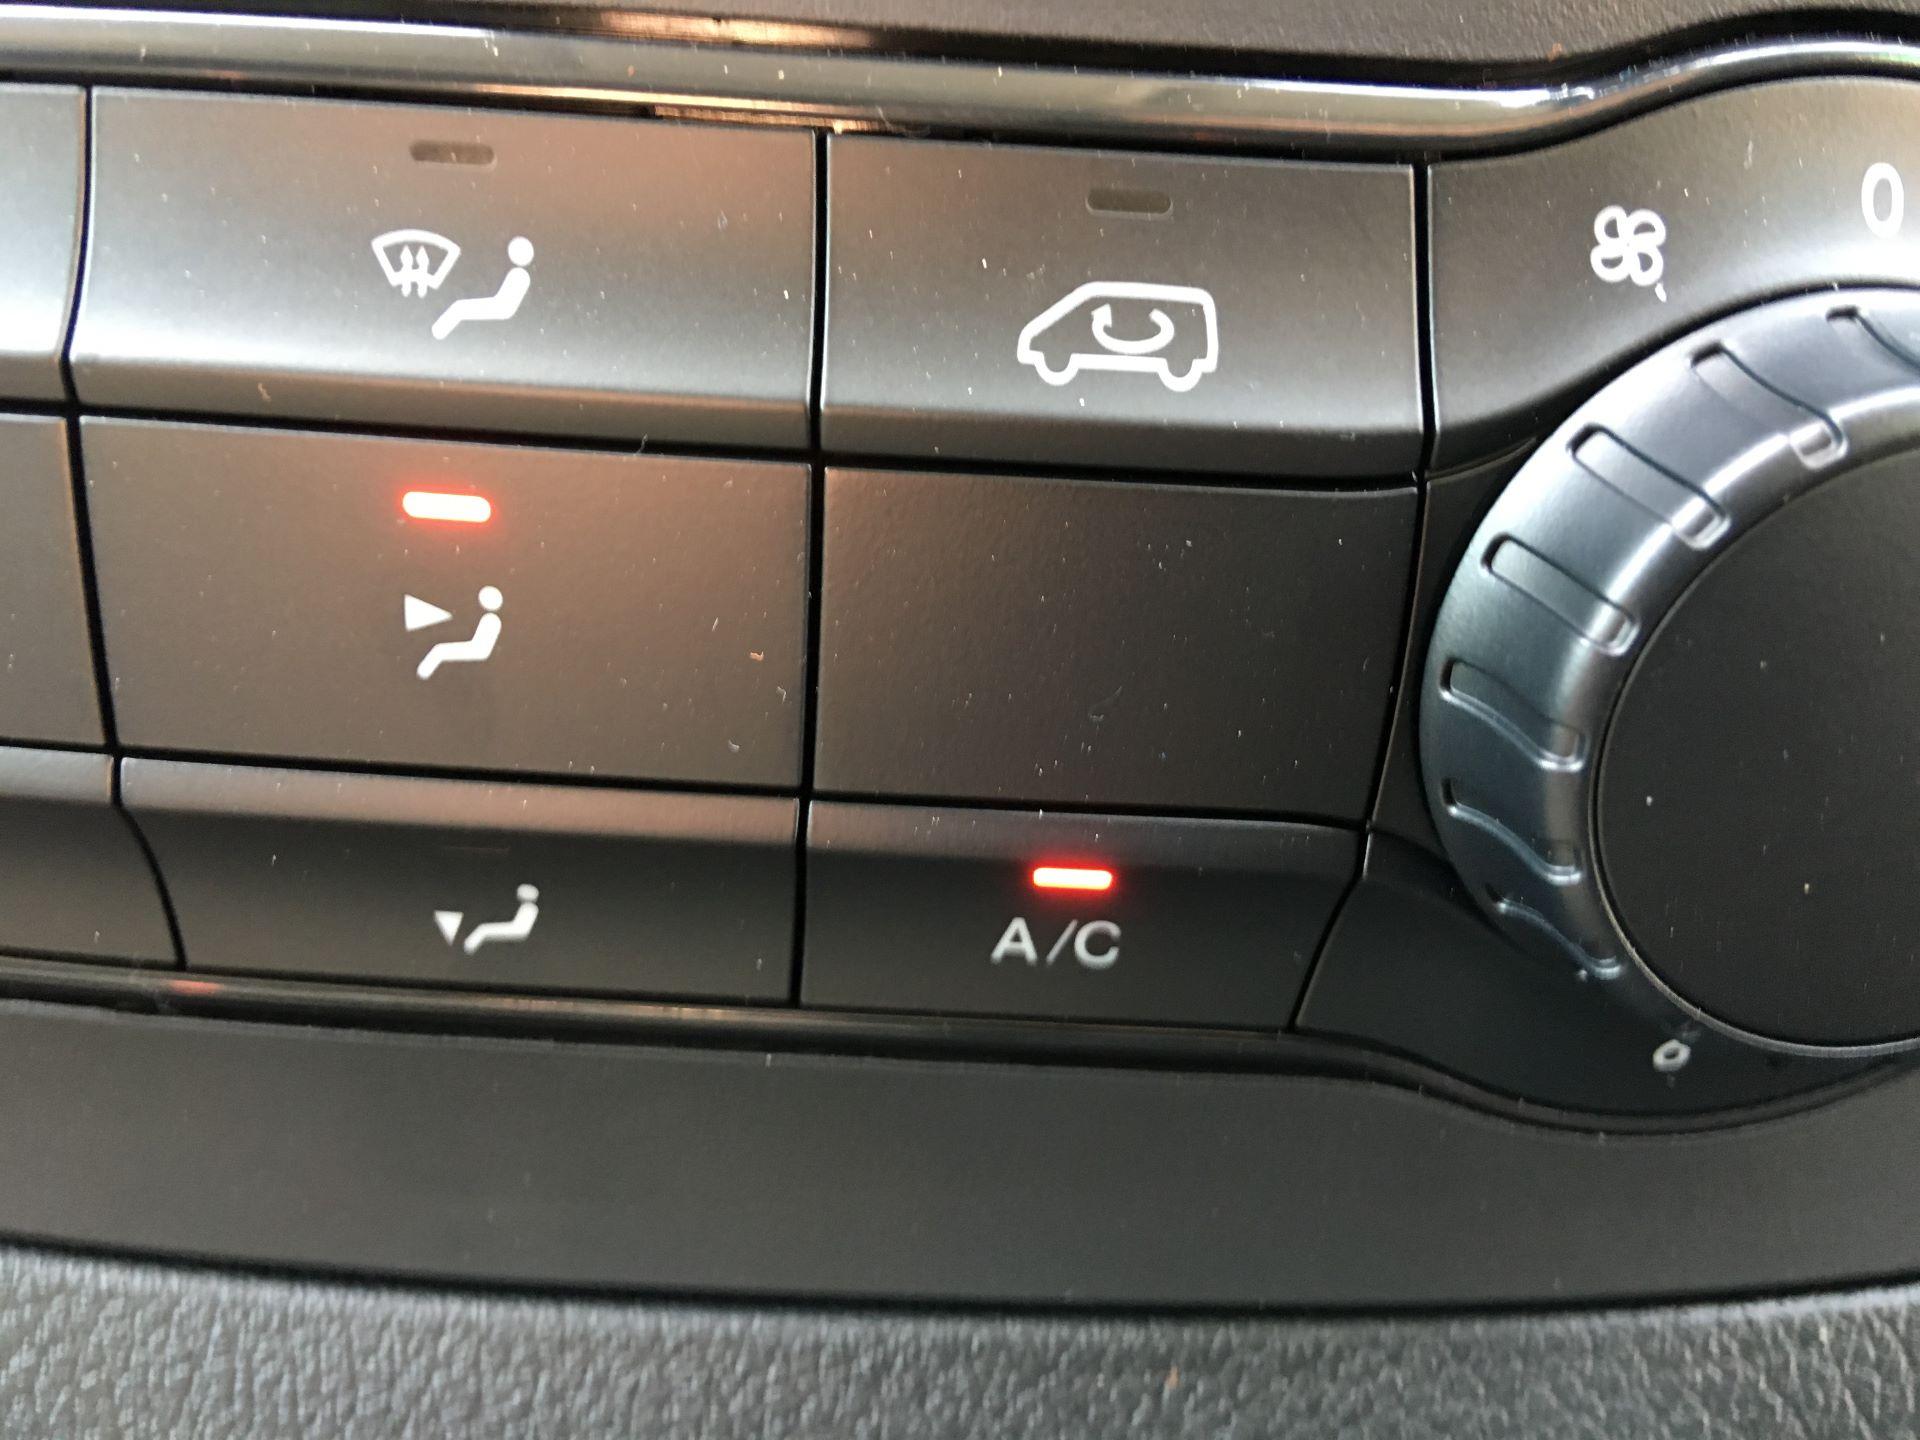 2019 Mercedes-Benz Vito LONG 111 CDI VAN EURO 5/6 (YM19HGC) Image 9